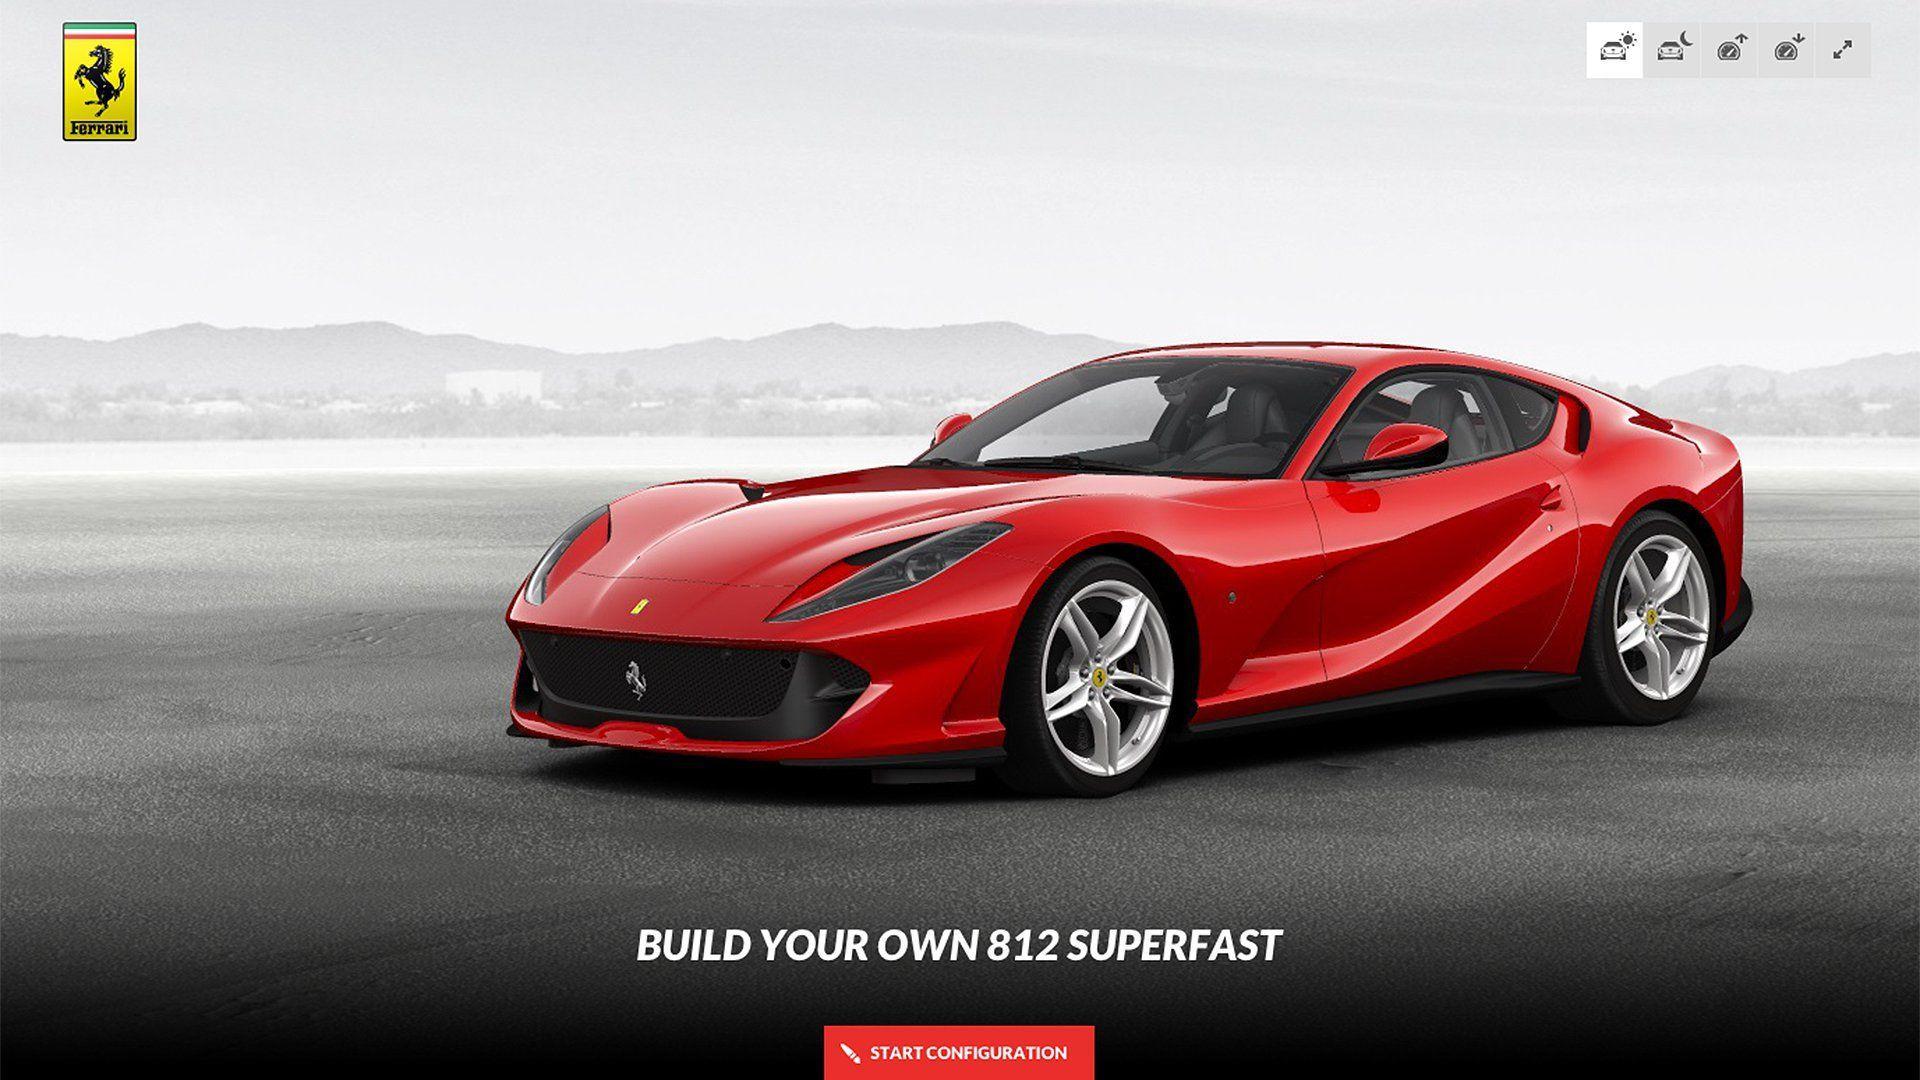 Ferrari 812 Superfast Wallpapers Wallpaper Cave